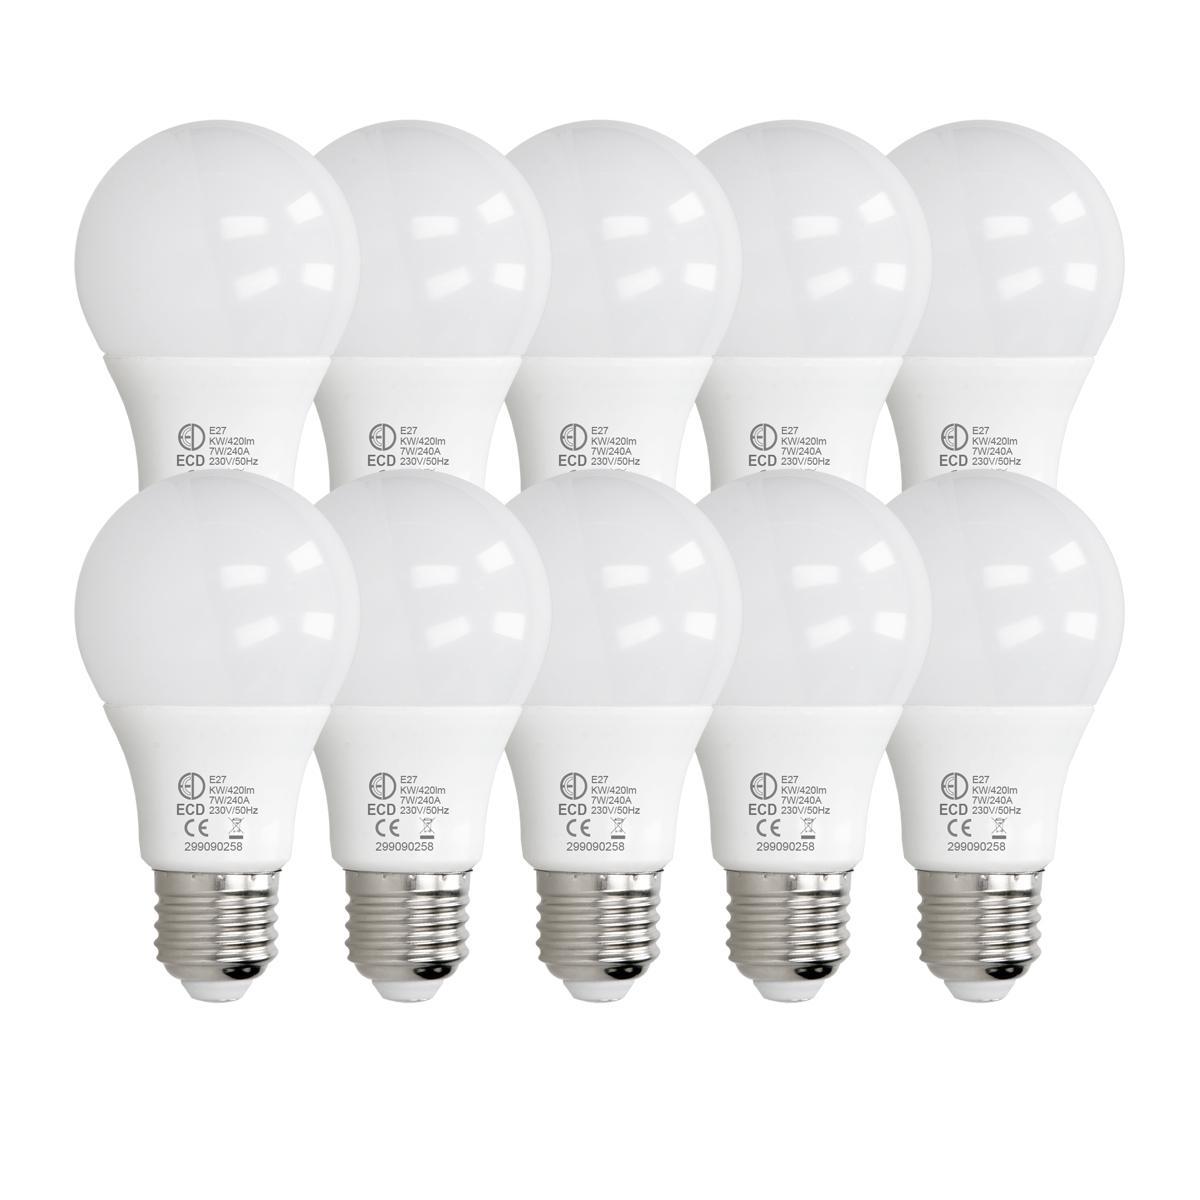 Ecd Germany ECD Germany 10 pièces 7W E27 ampoule LED   3000 Kelvin   Angle de faisceau 270 °   420 lumens   Blanc chaud   220-240 v